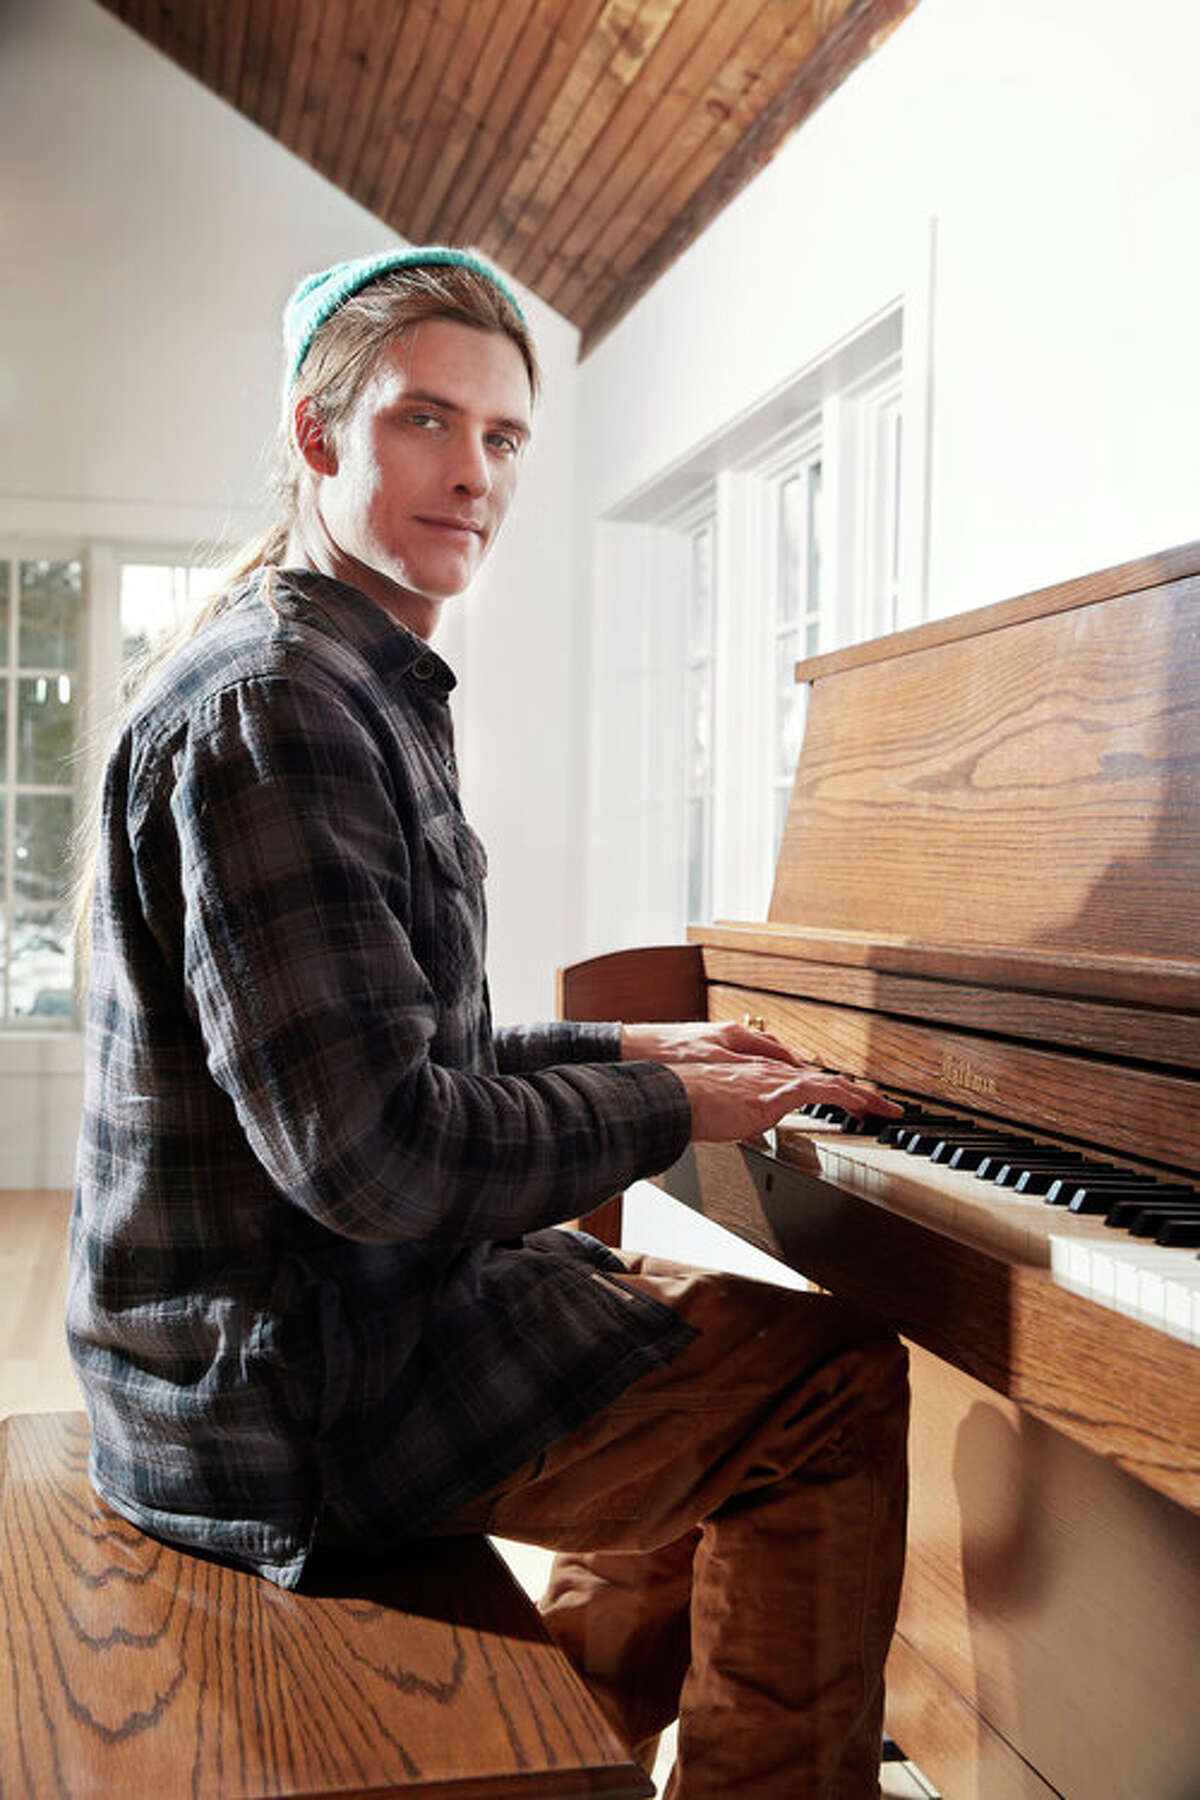 Benjamin Lerner with his piano. (Courtesy of Joshua Sherman Productions)